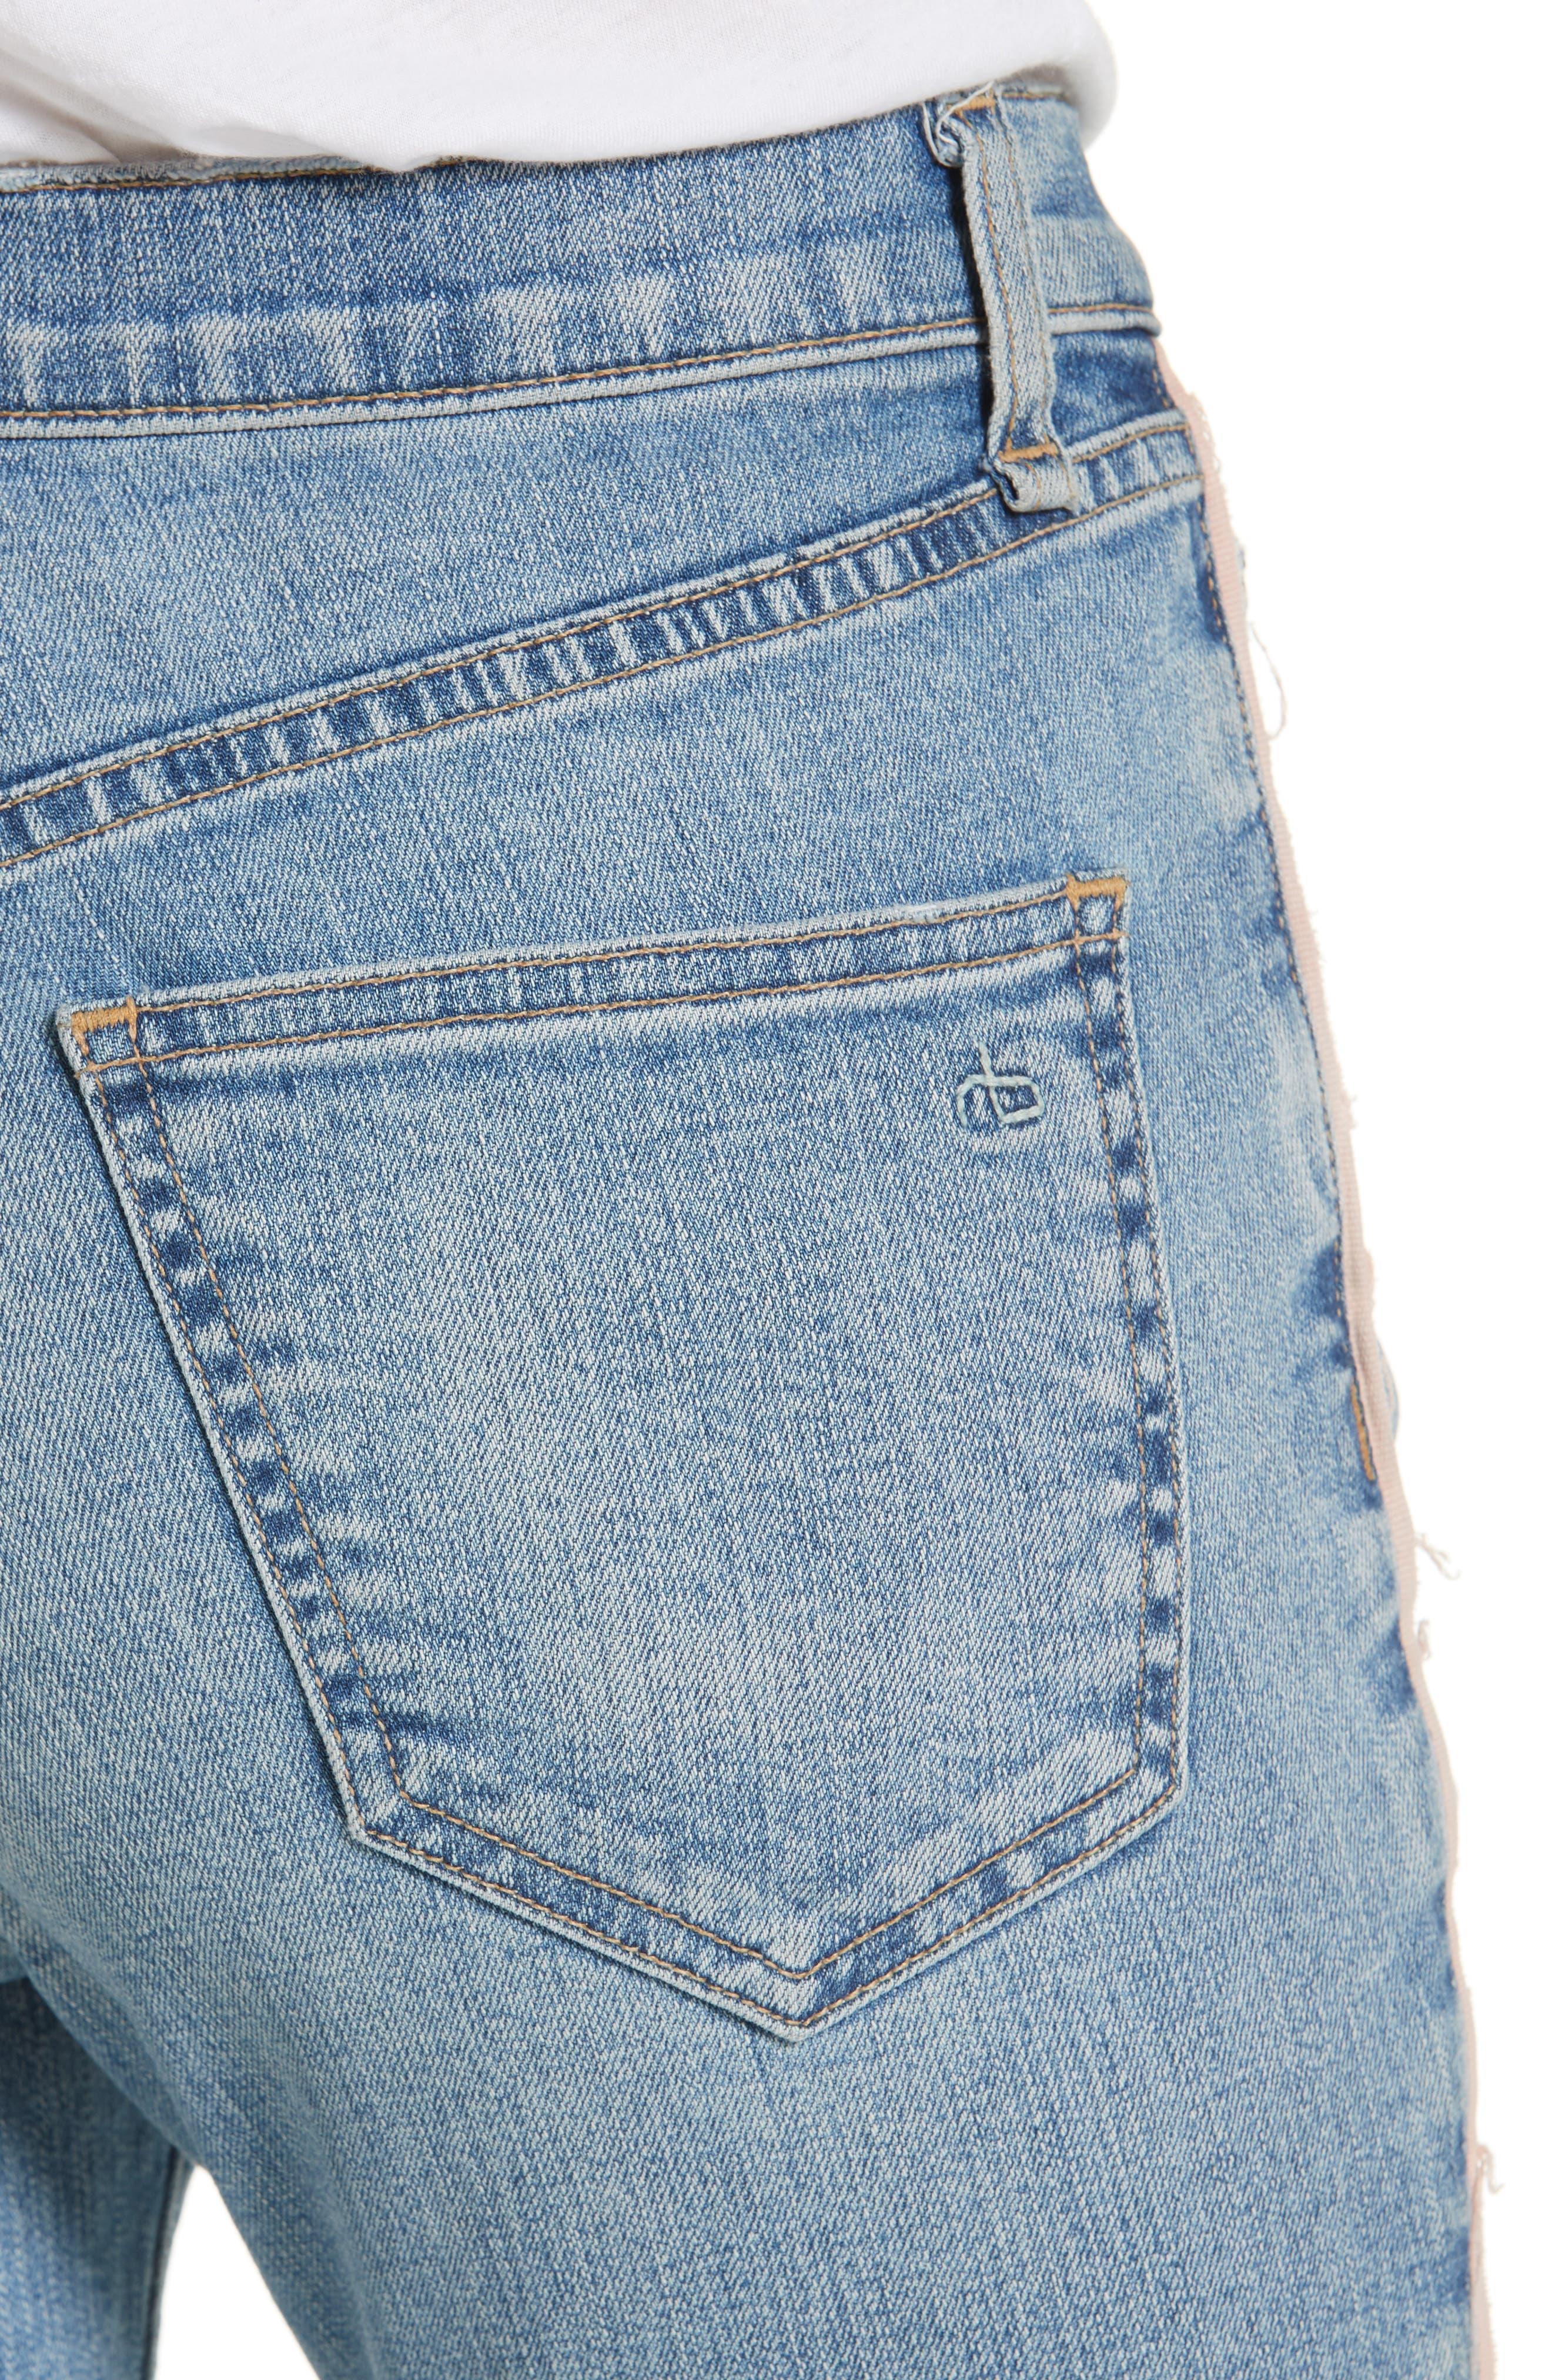 Skinny Jeans,                             Alternate thumbnail 4, color,                             Liho